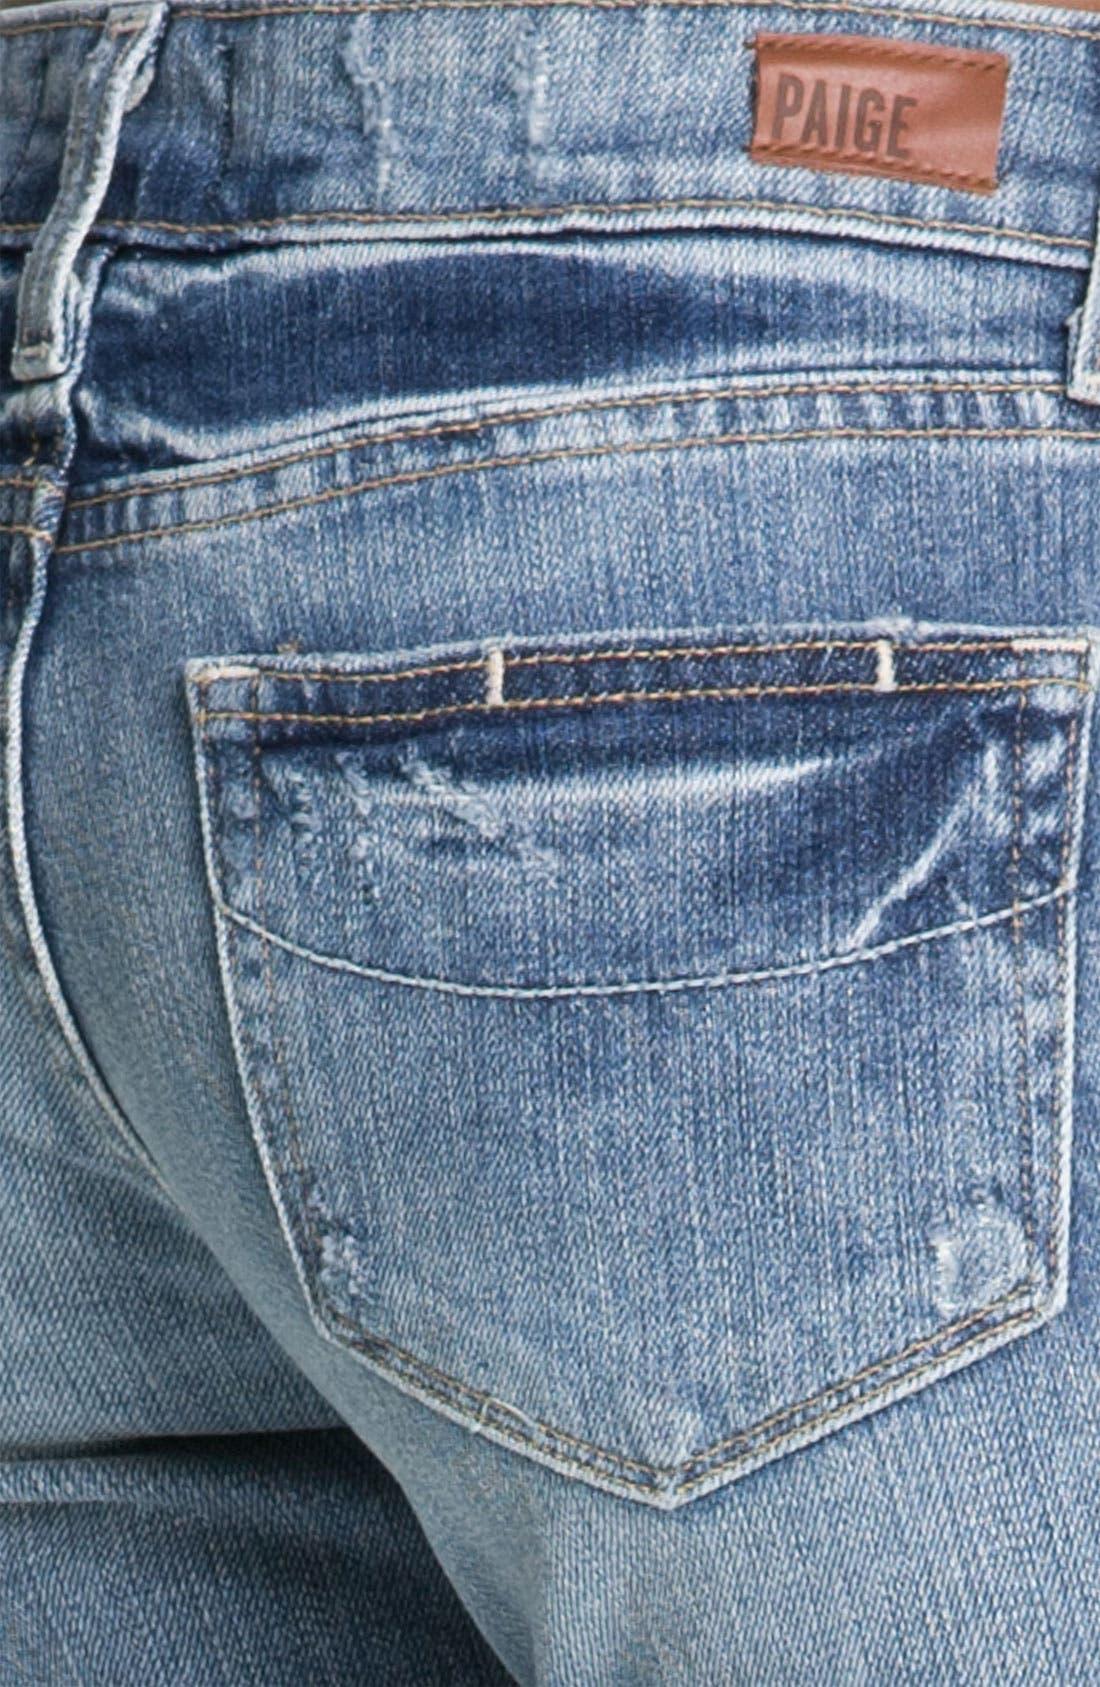 Alternate Image 3  - Paige Denim 'Skyline - Ankle Peg' Skinny Stretch Jeans (Beachwood)